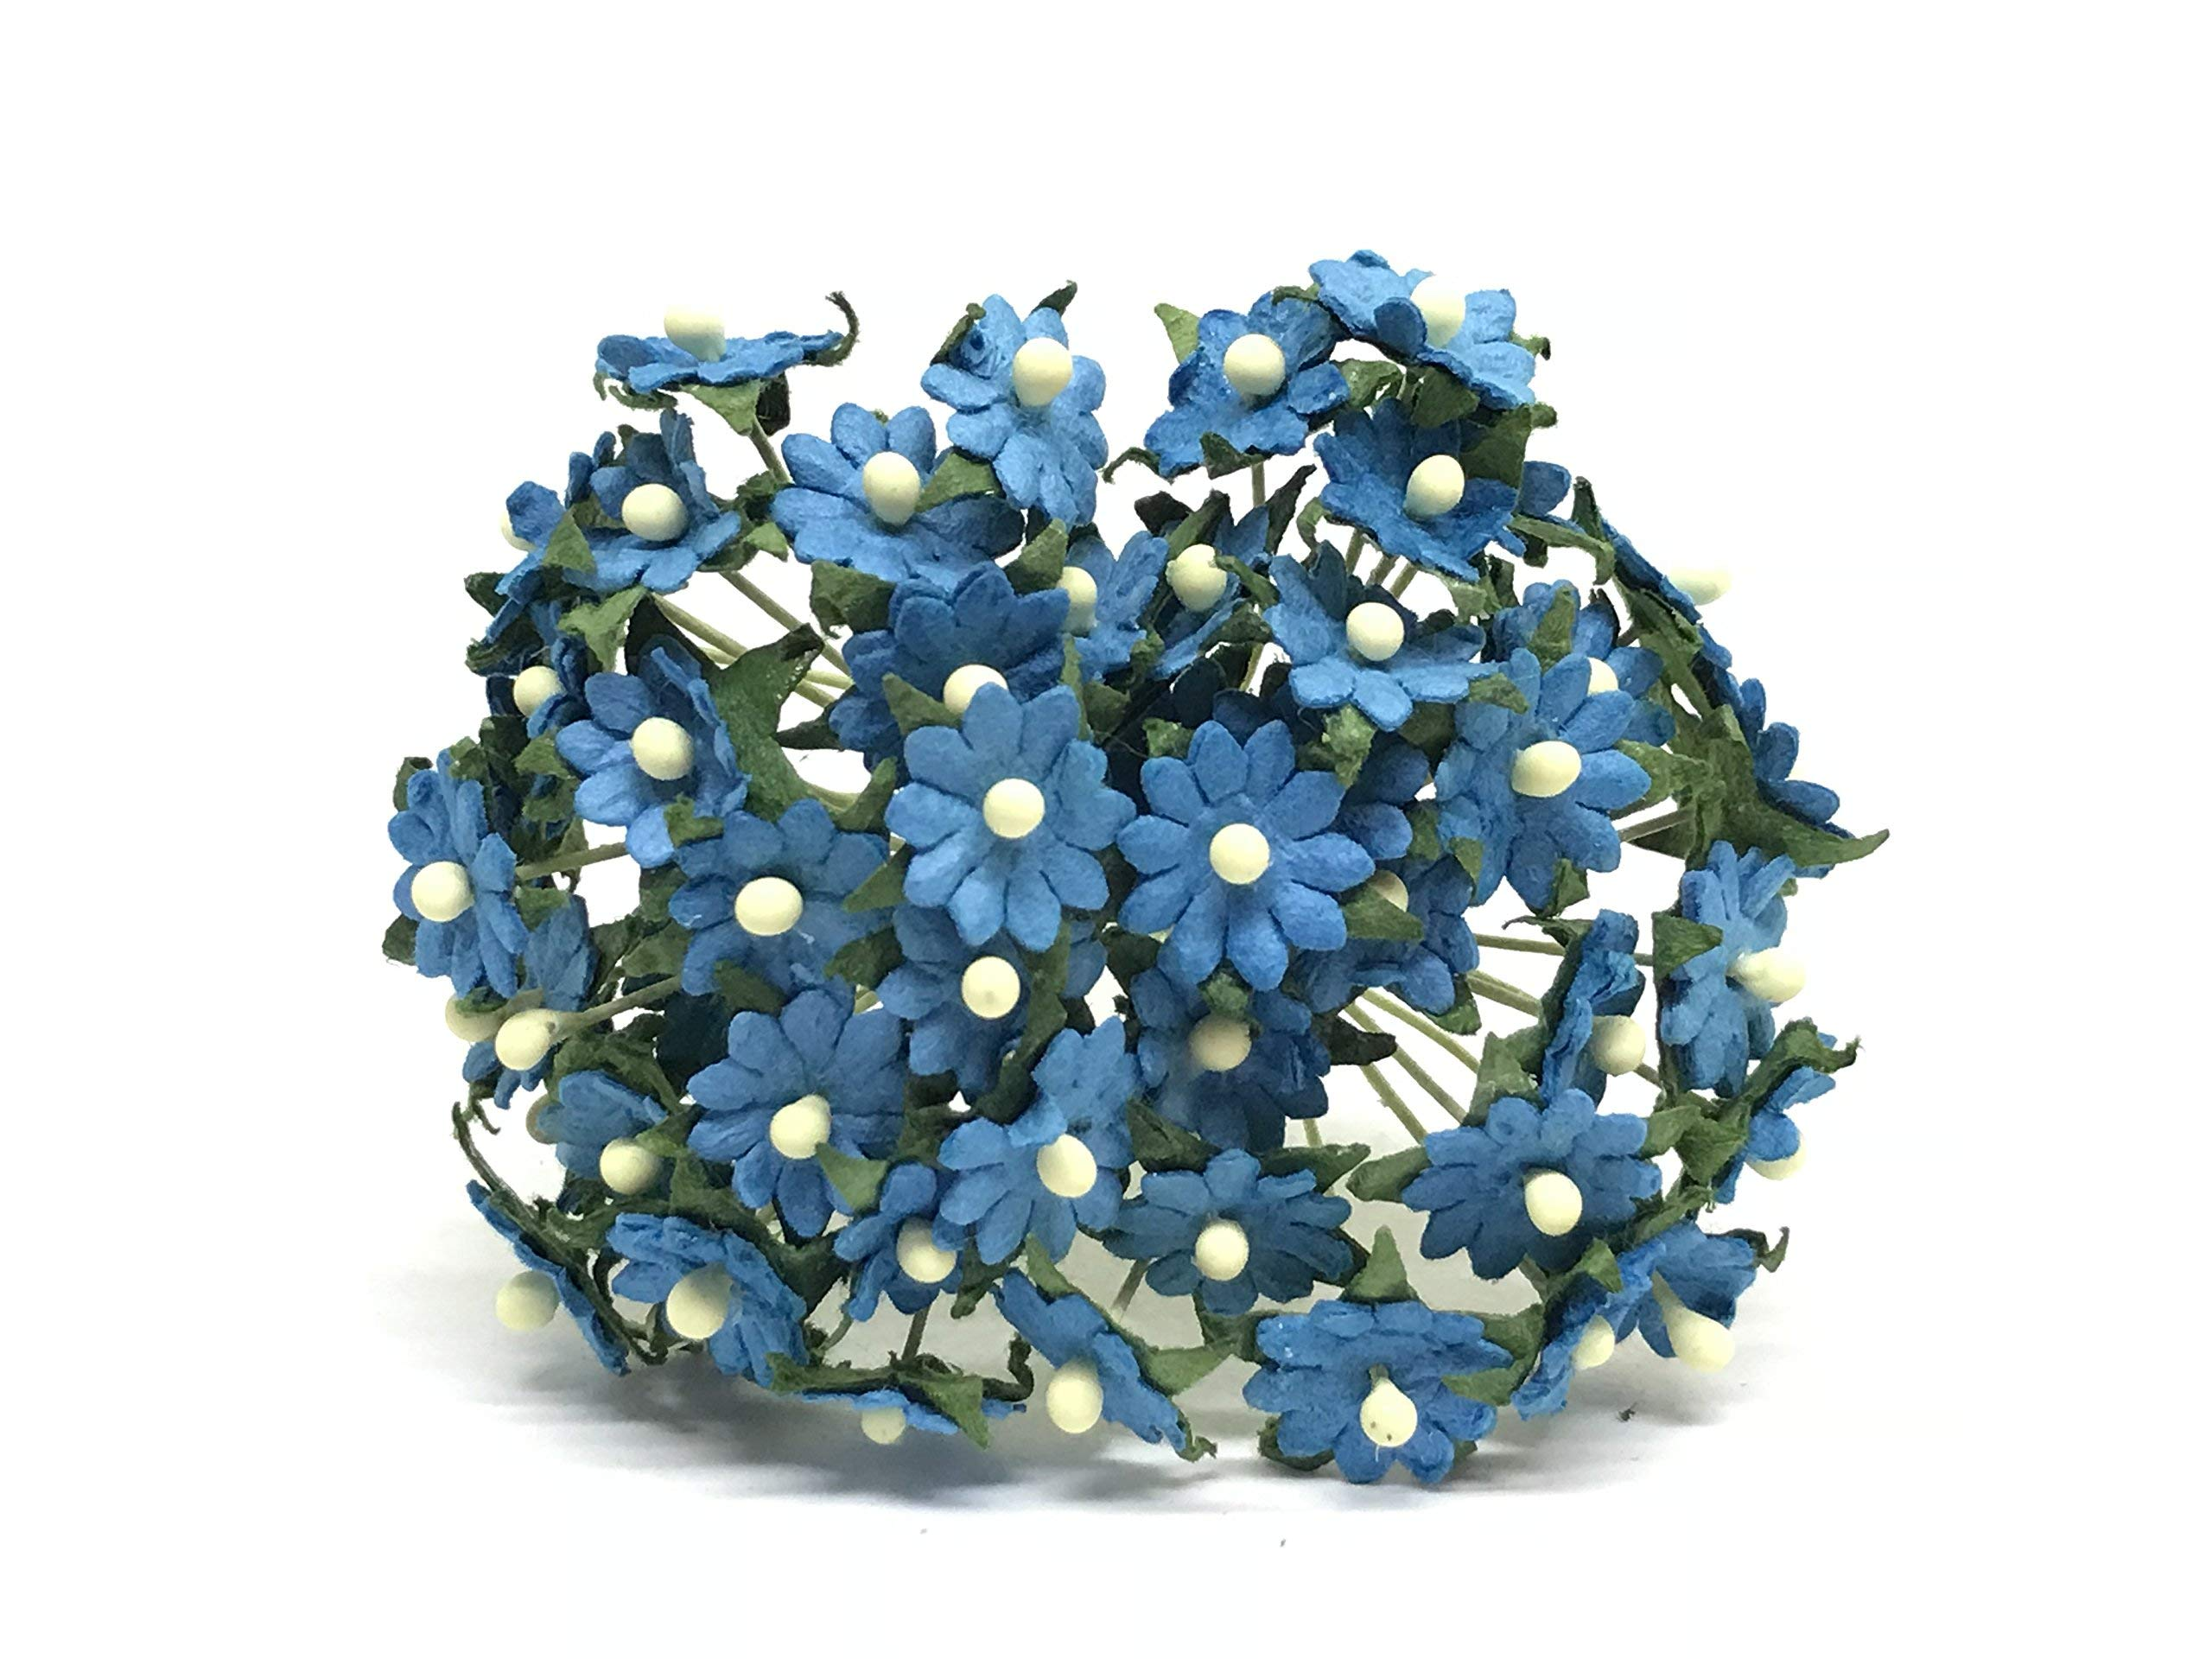 1cm-Blue-Paper-Daisies-Mulberry-Paper-Flowers-Miniature-Flowers-For-Crafts-Mulberry-Paper-Daisy-Paper-Flower-Artificial-Flowers-50-Pieces